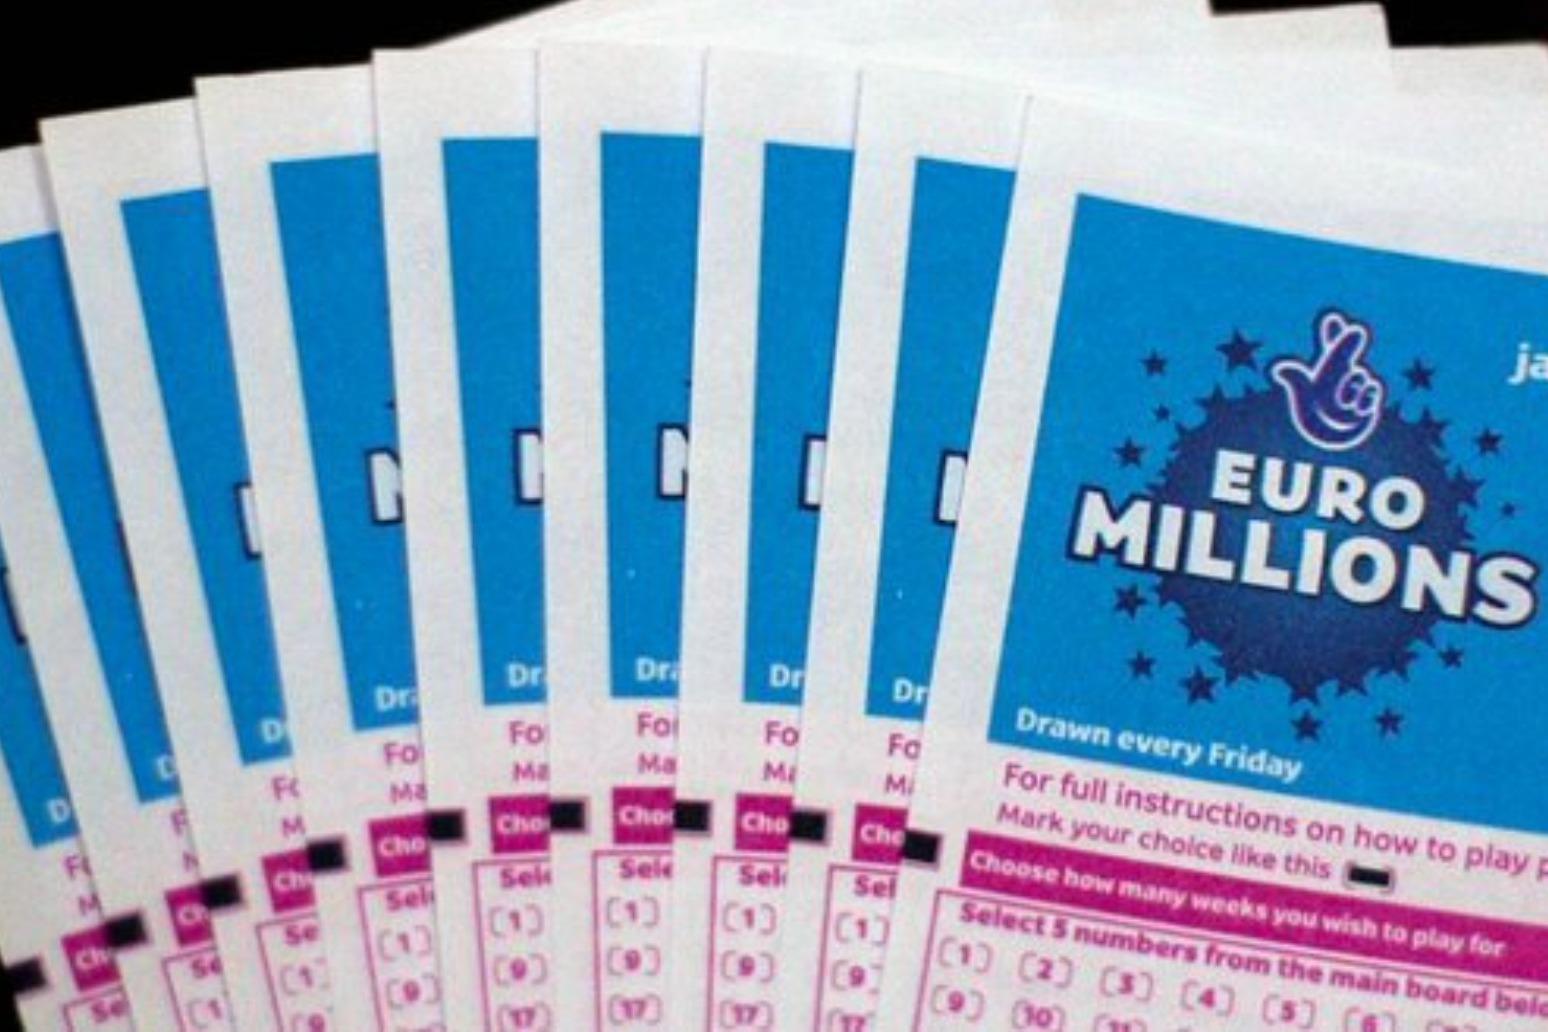 Twenty UK ticket holders win £1m each in Friday's EuroMillions draw